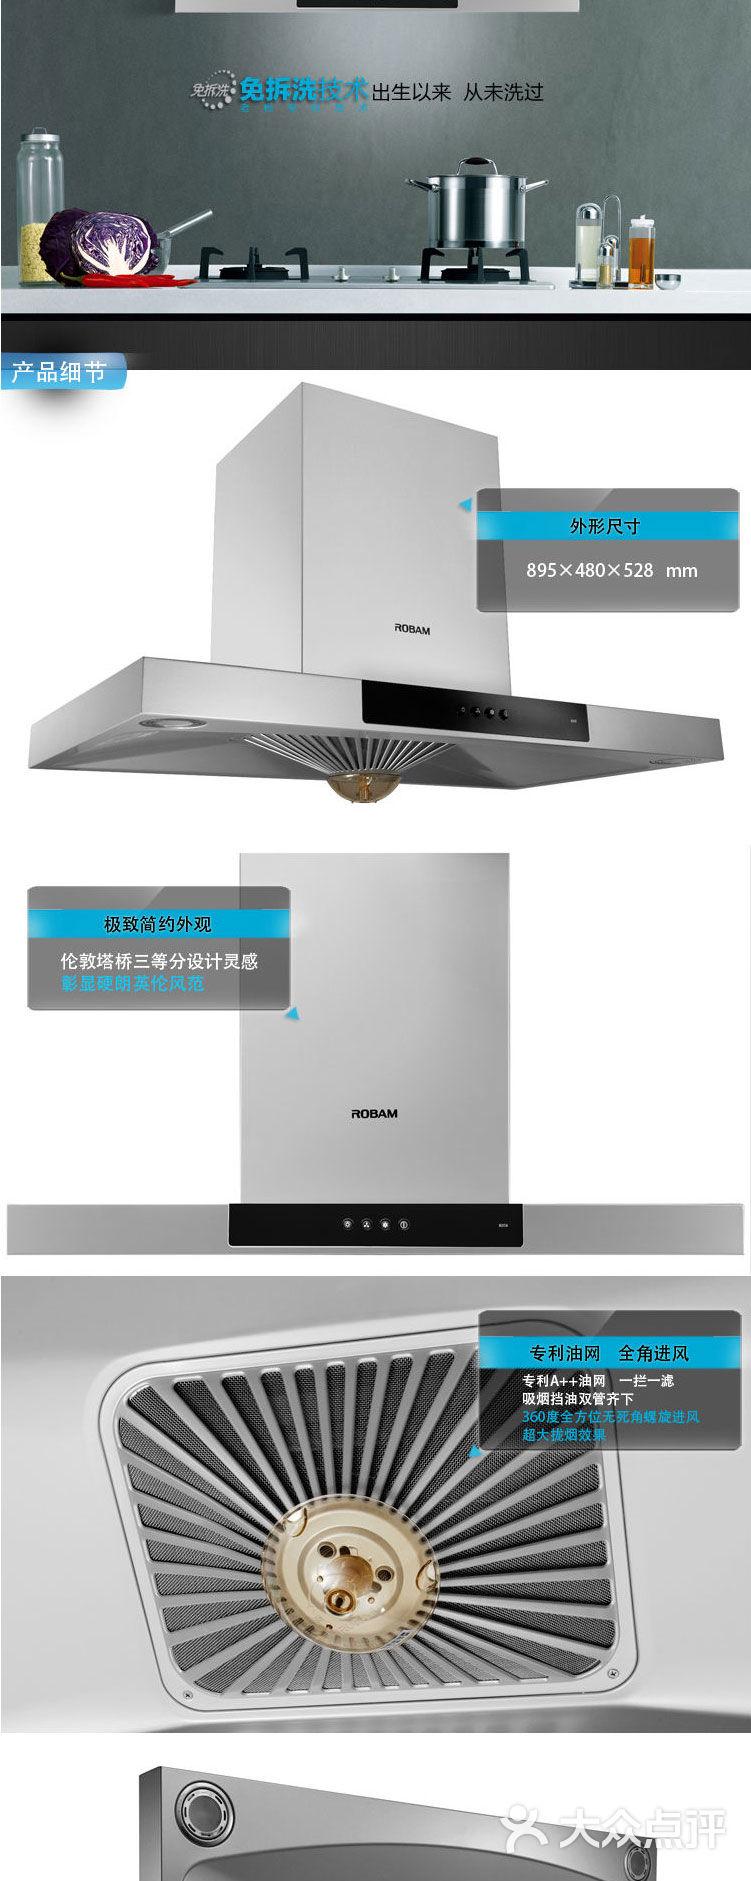 【cxw-200-8005大吸力油烟机-家装套餐】-老板电器店